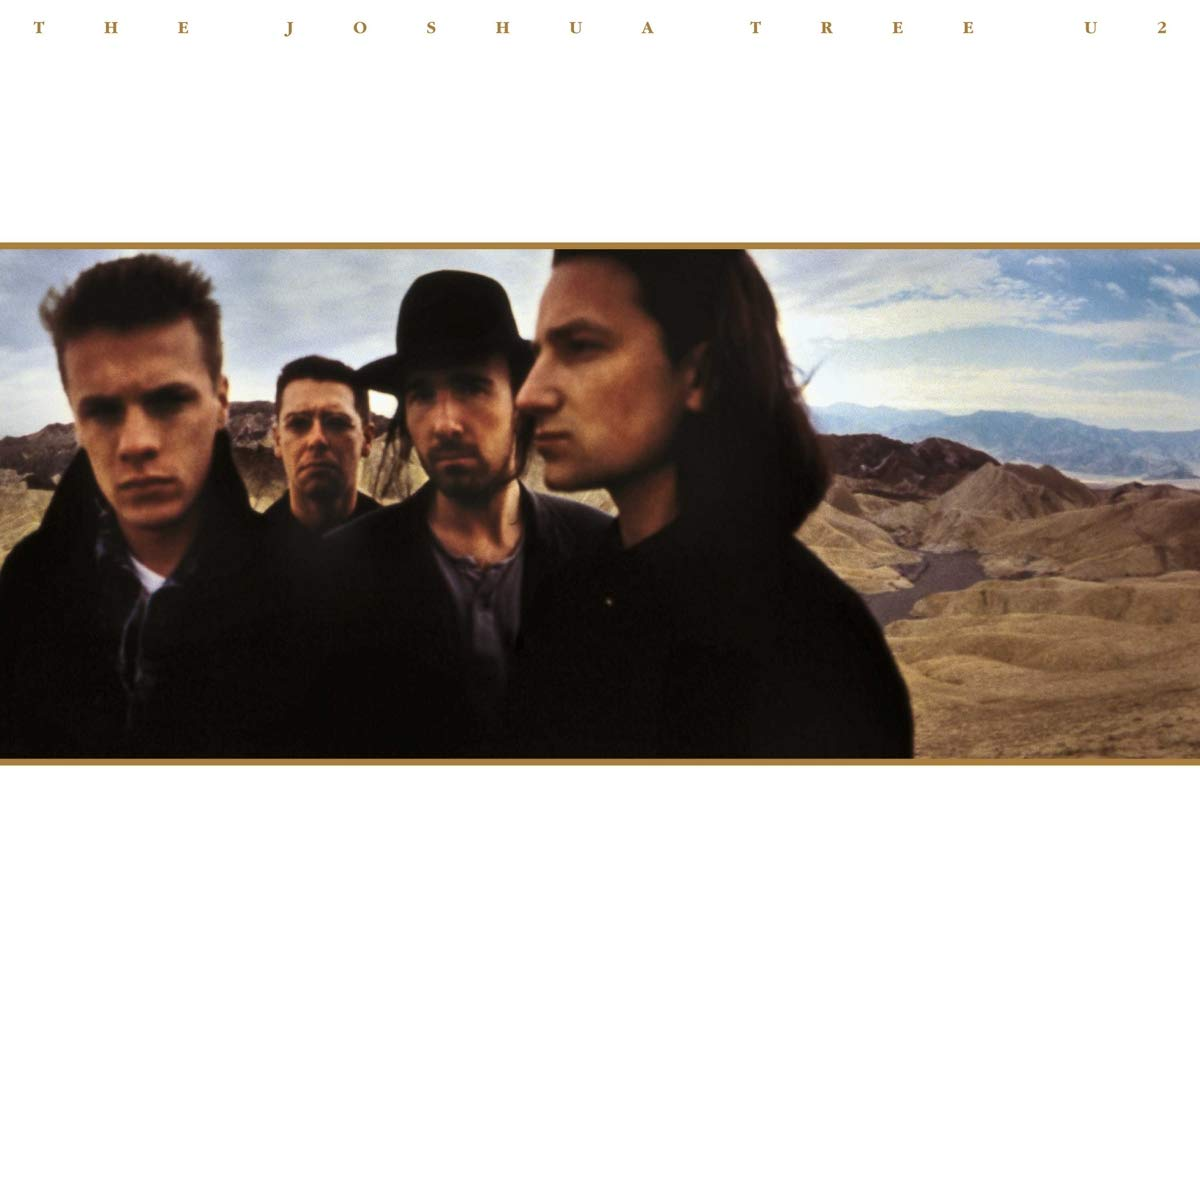 The Joshua Tree : U2, U2: Amazon.es: Música